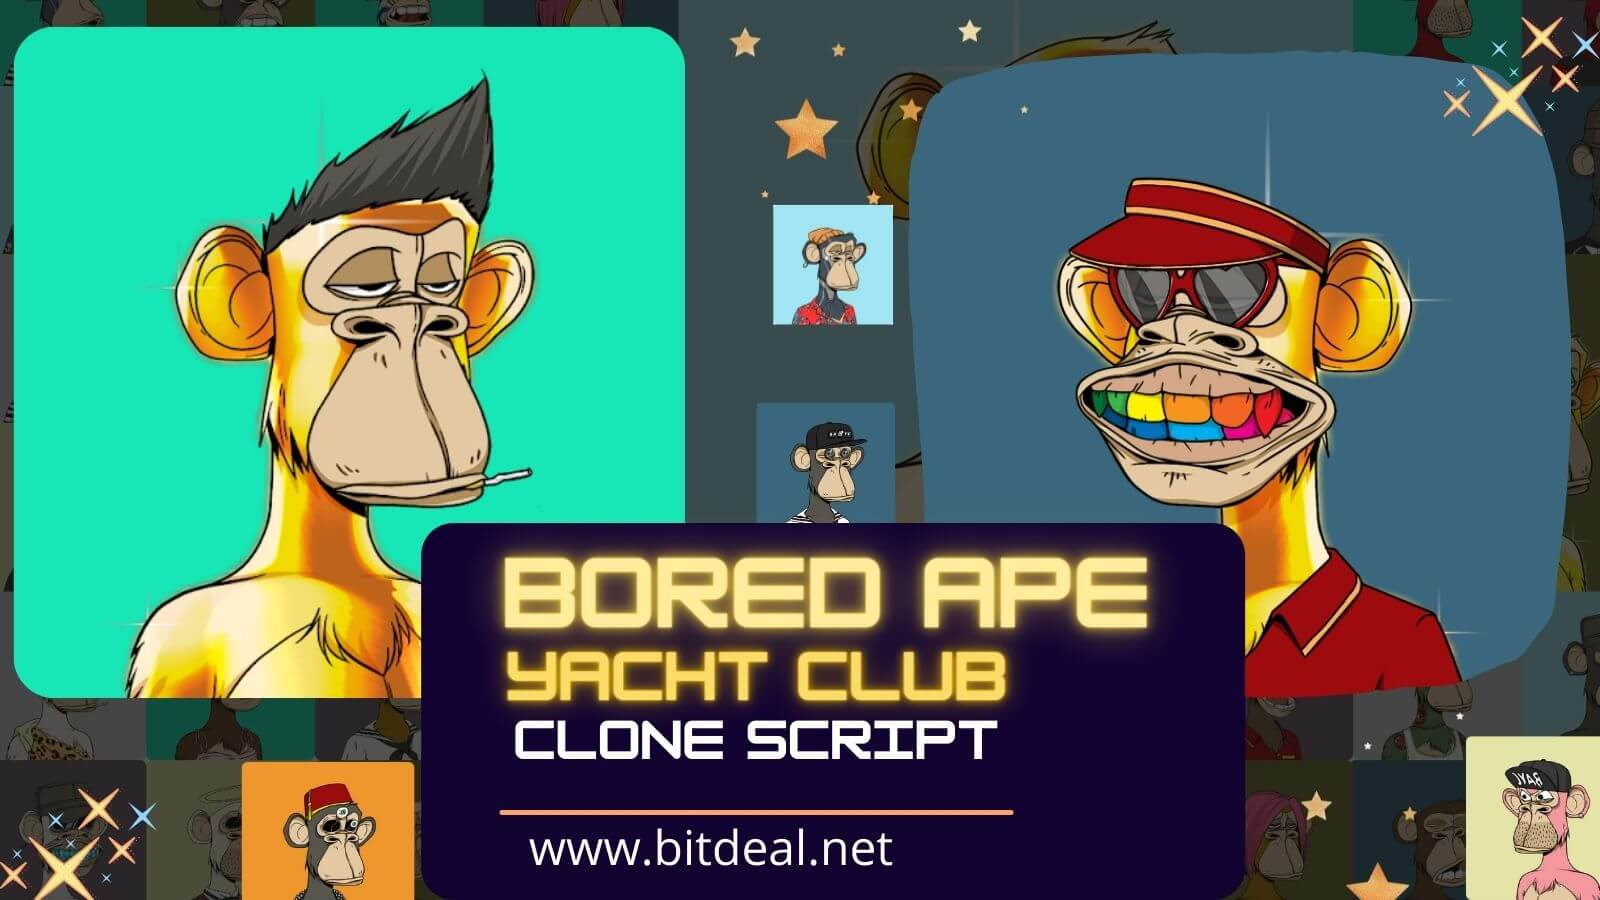 Bored Ape Yacht Club Clone Script to Build NFT Marketplace like Bored Ape Yacht Club (BAYC)